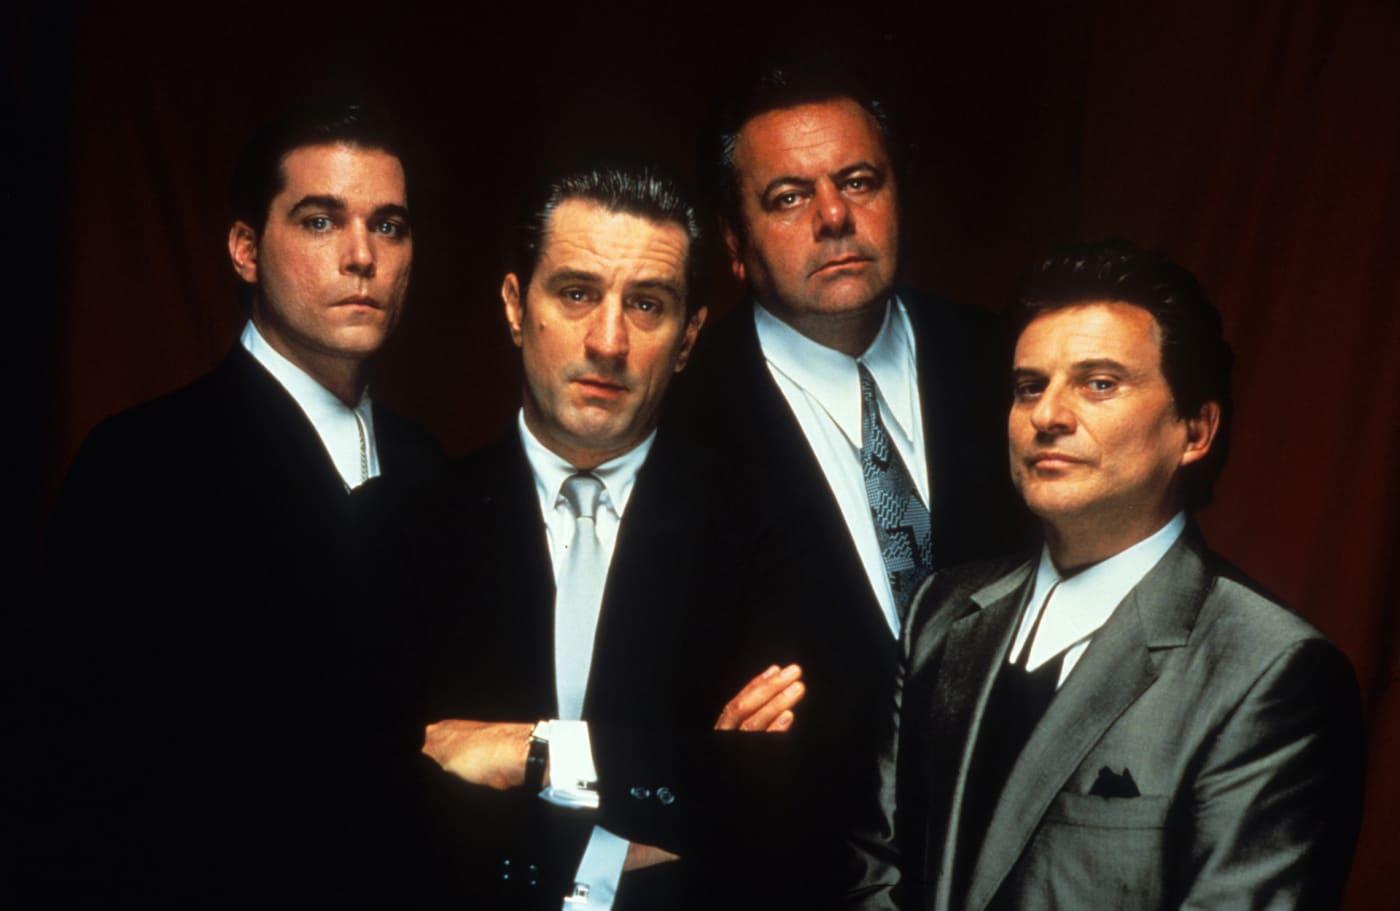 Ray Liotta, Robert De Niro, Paul Sorvino, and Joe Pesci publicity portrait for the film 'Goodfellas'